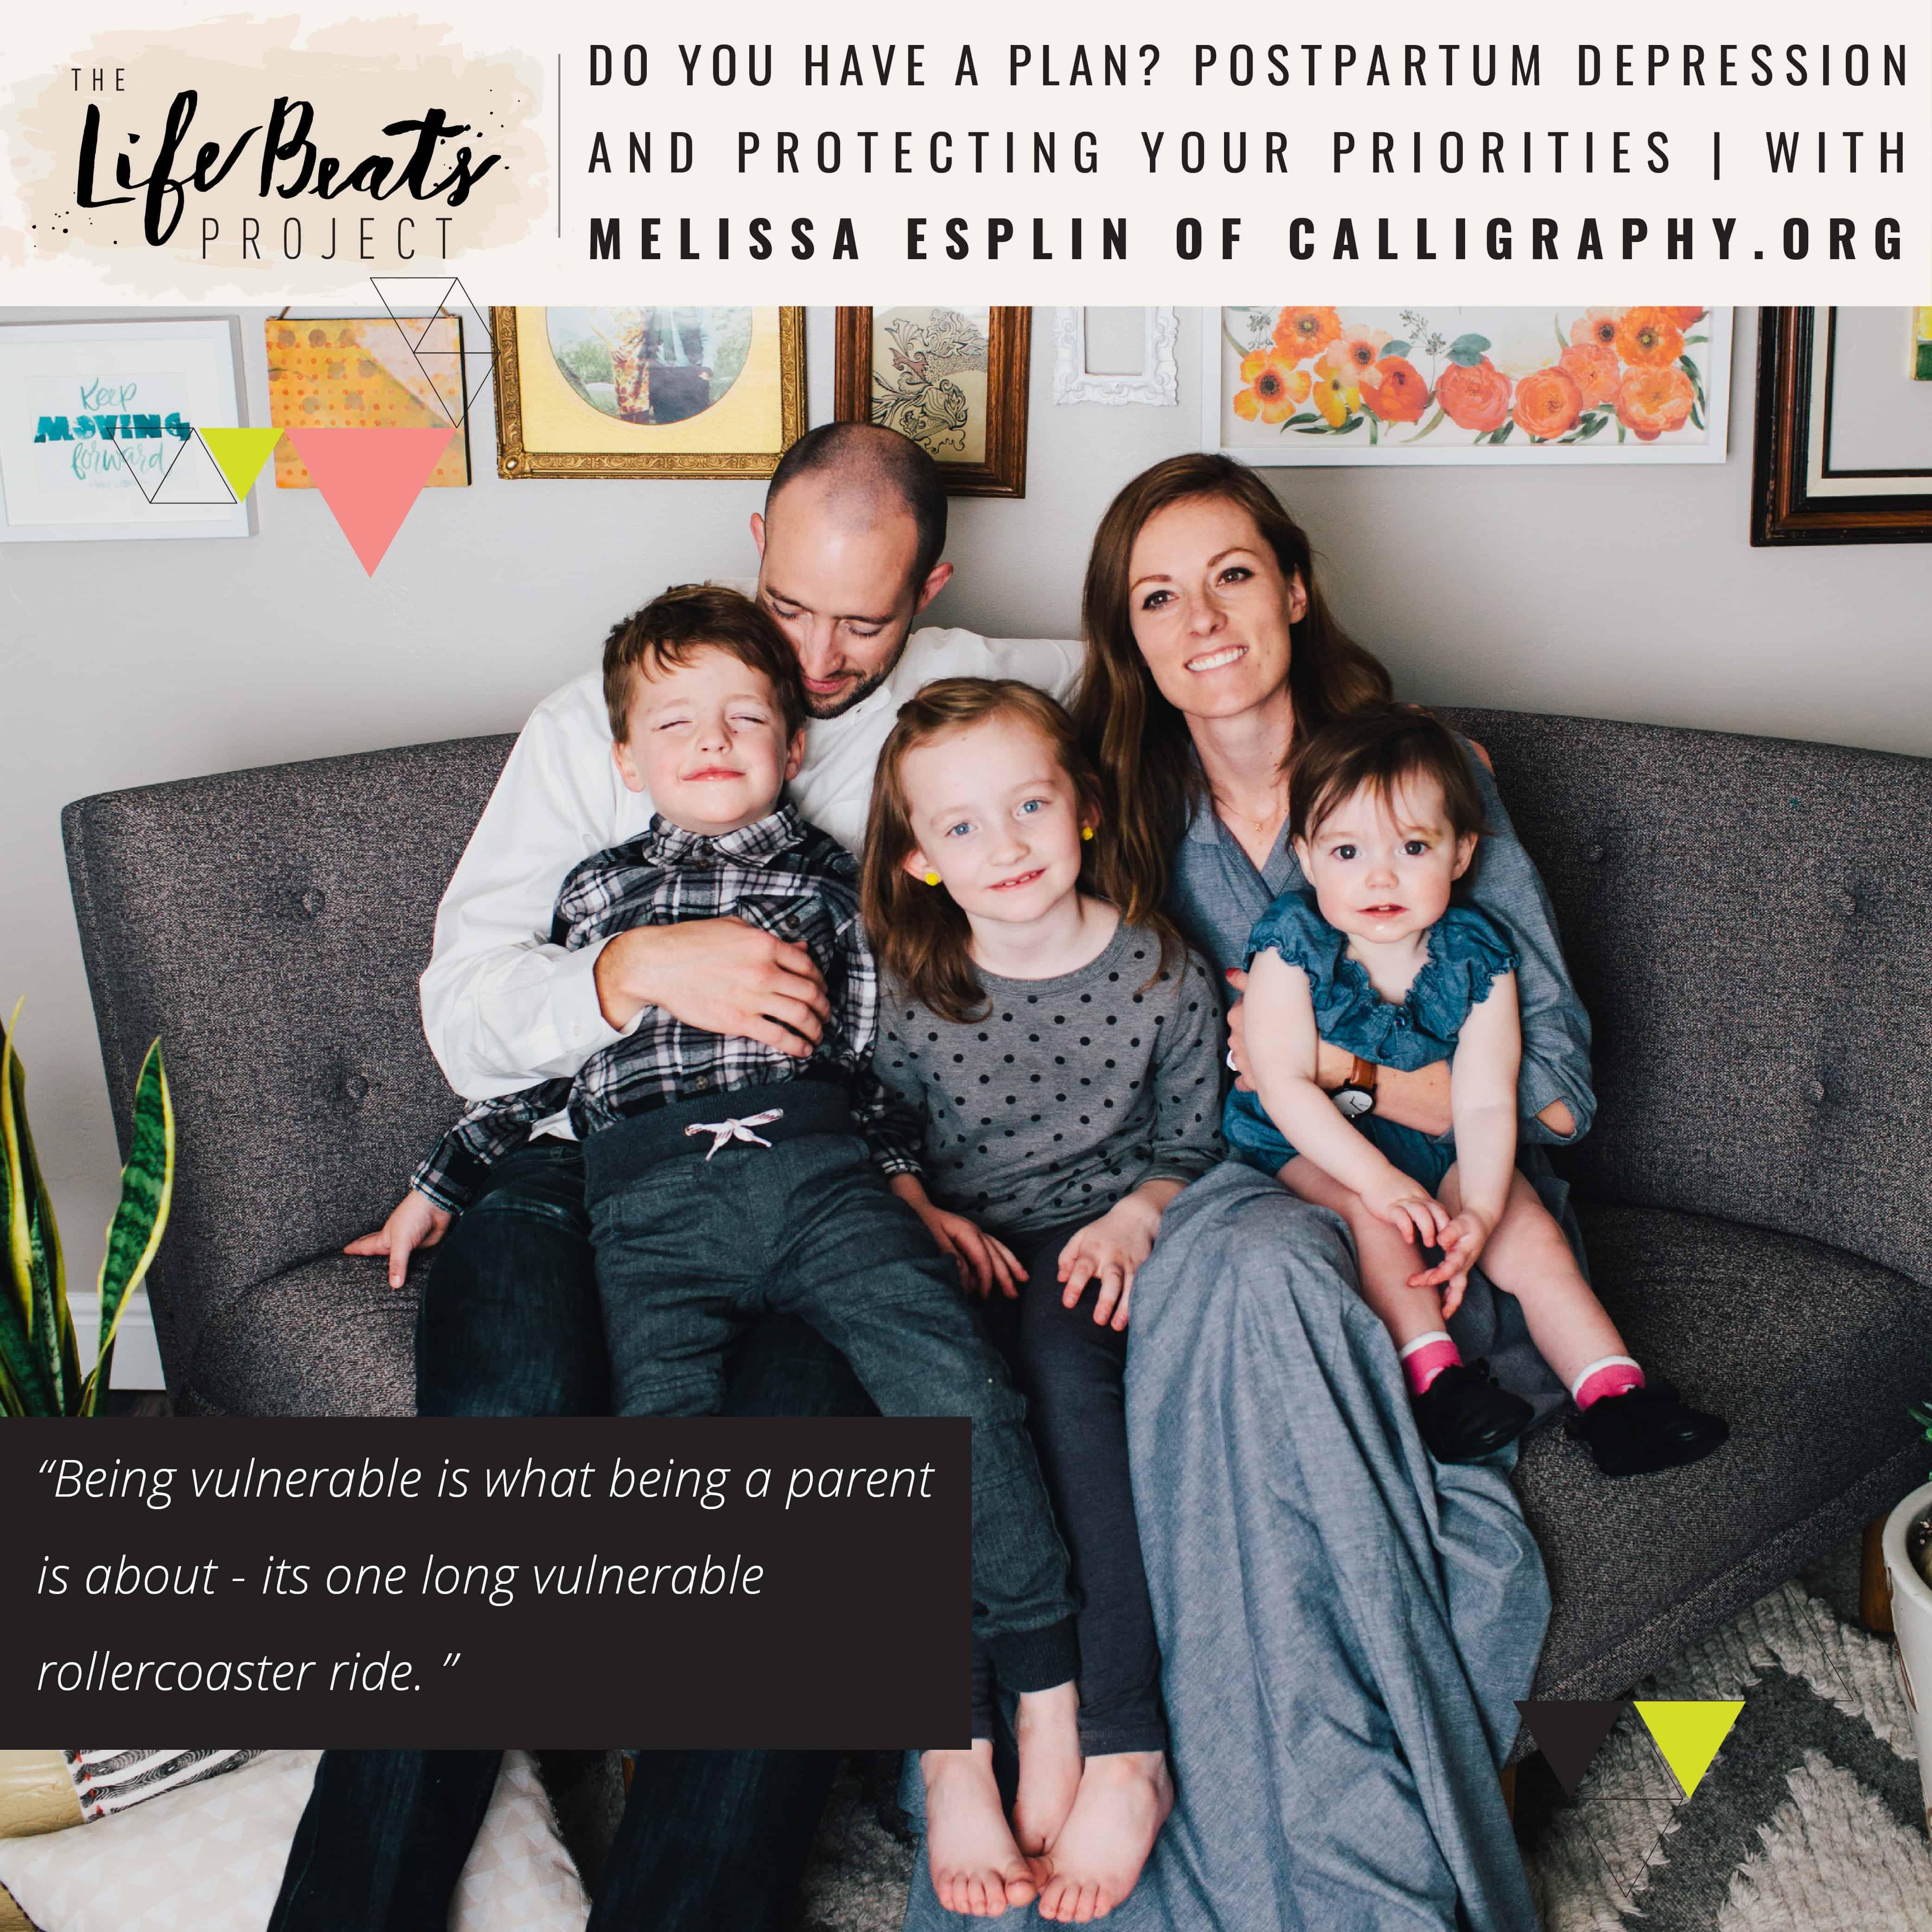 postpartum depression priorities anxiety motherhood baby blues